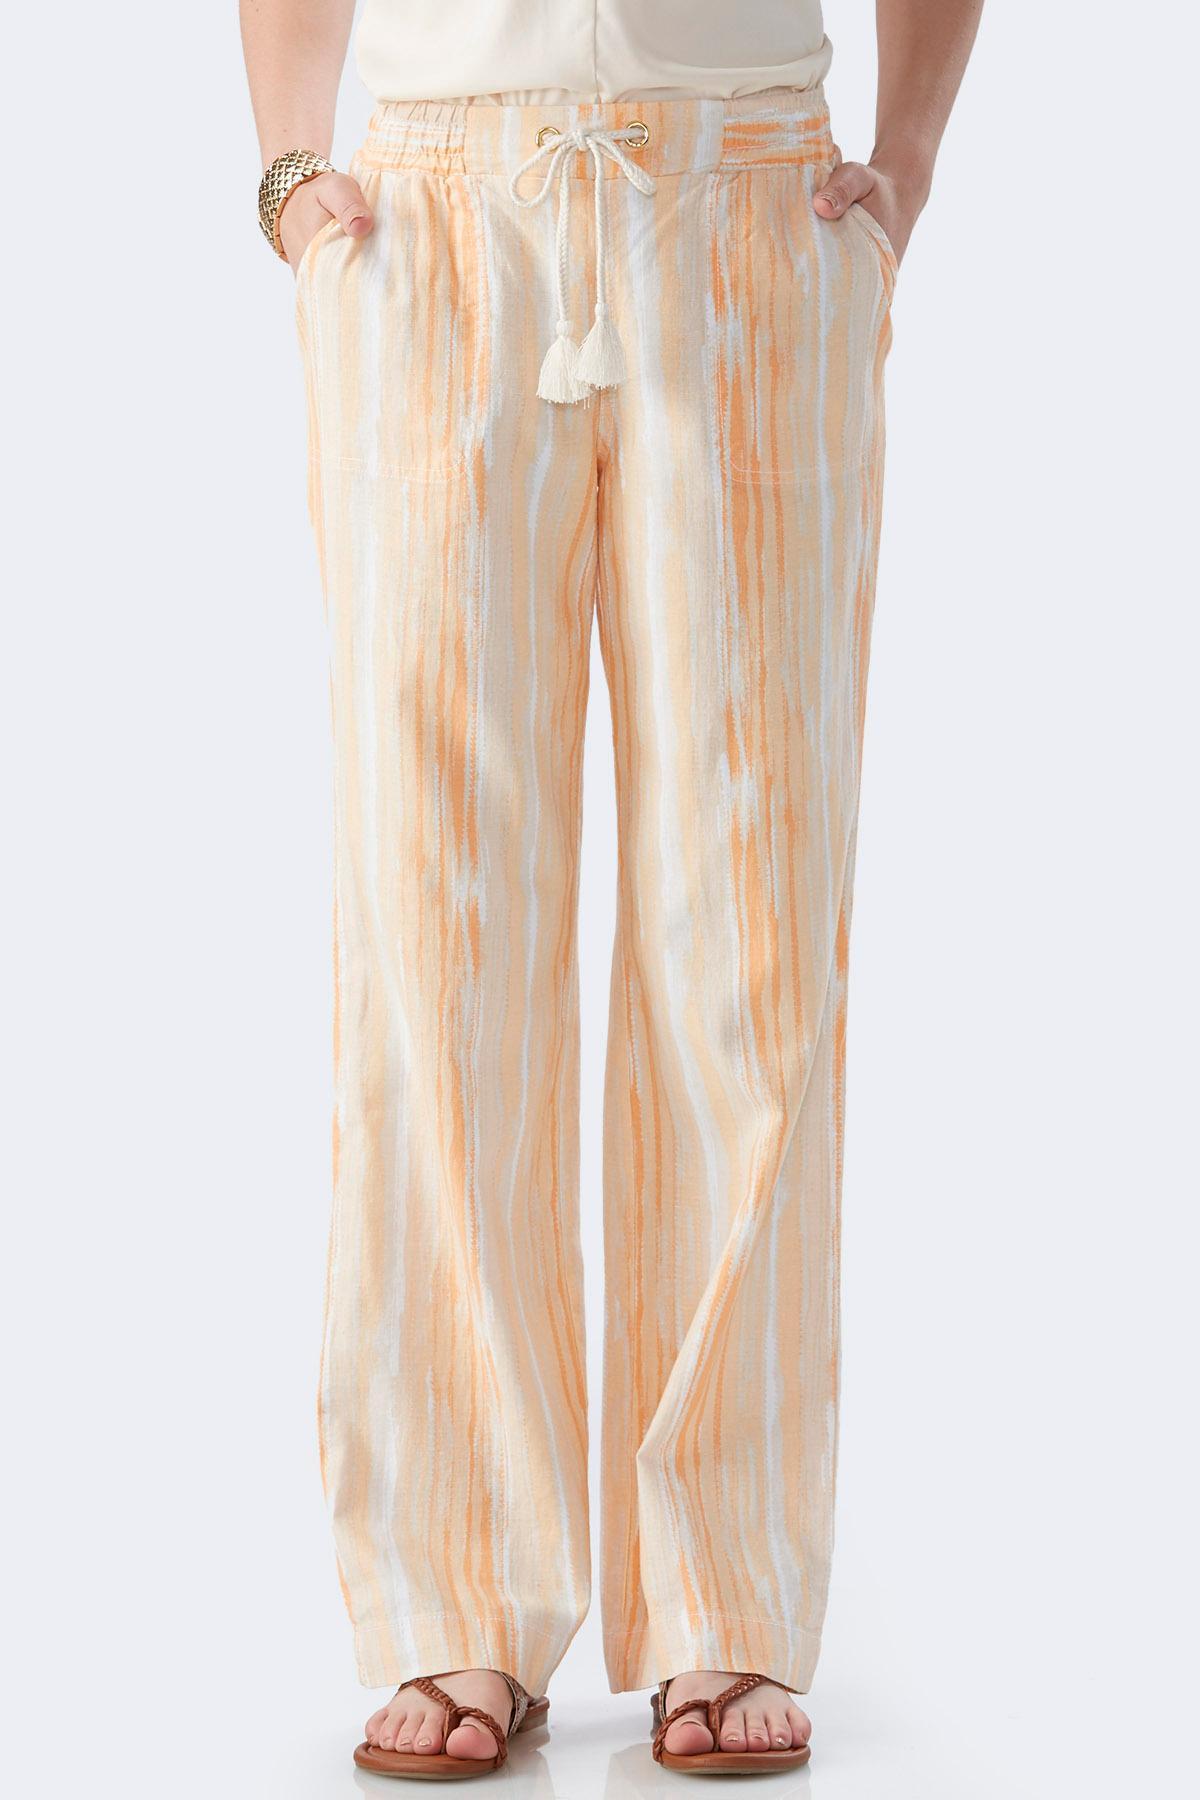 Ombre Wash Drawstring Linen Pants Pants | Cato Fashions